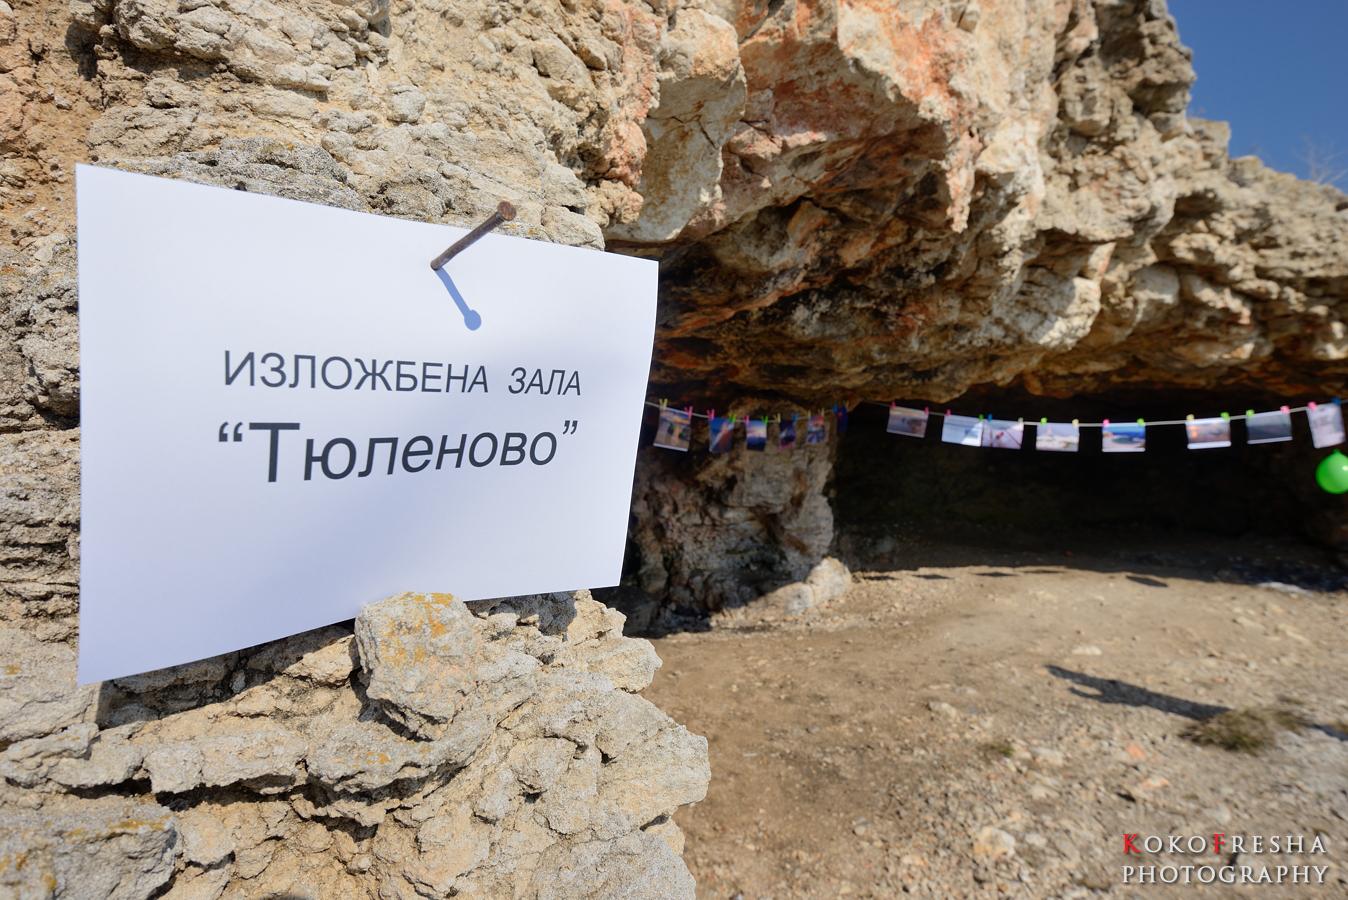 "Изложба в пещера - изложбена зала ""Тюленово"""